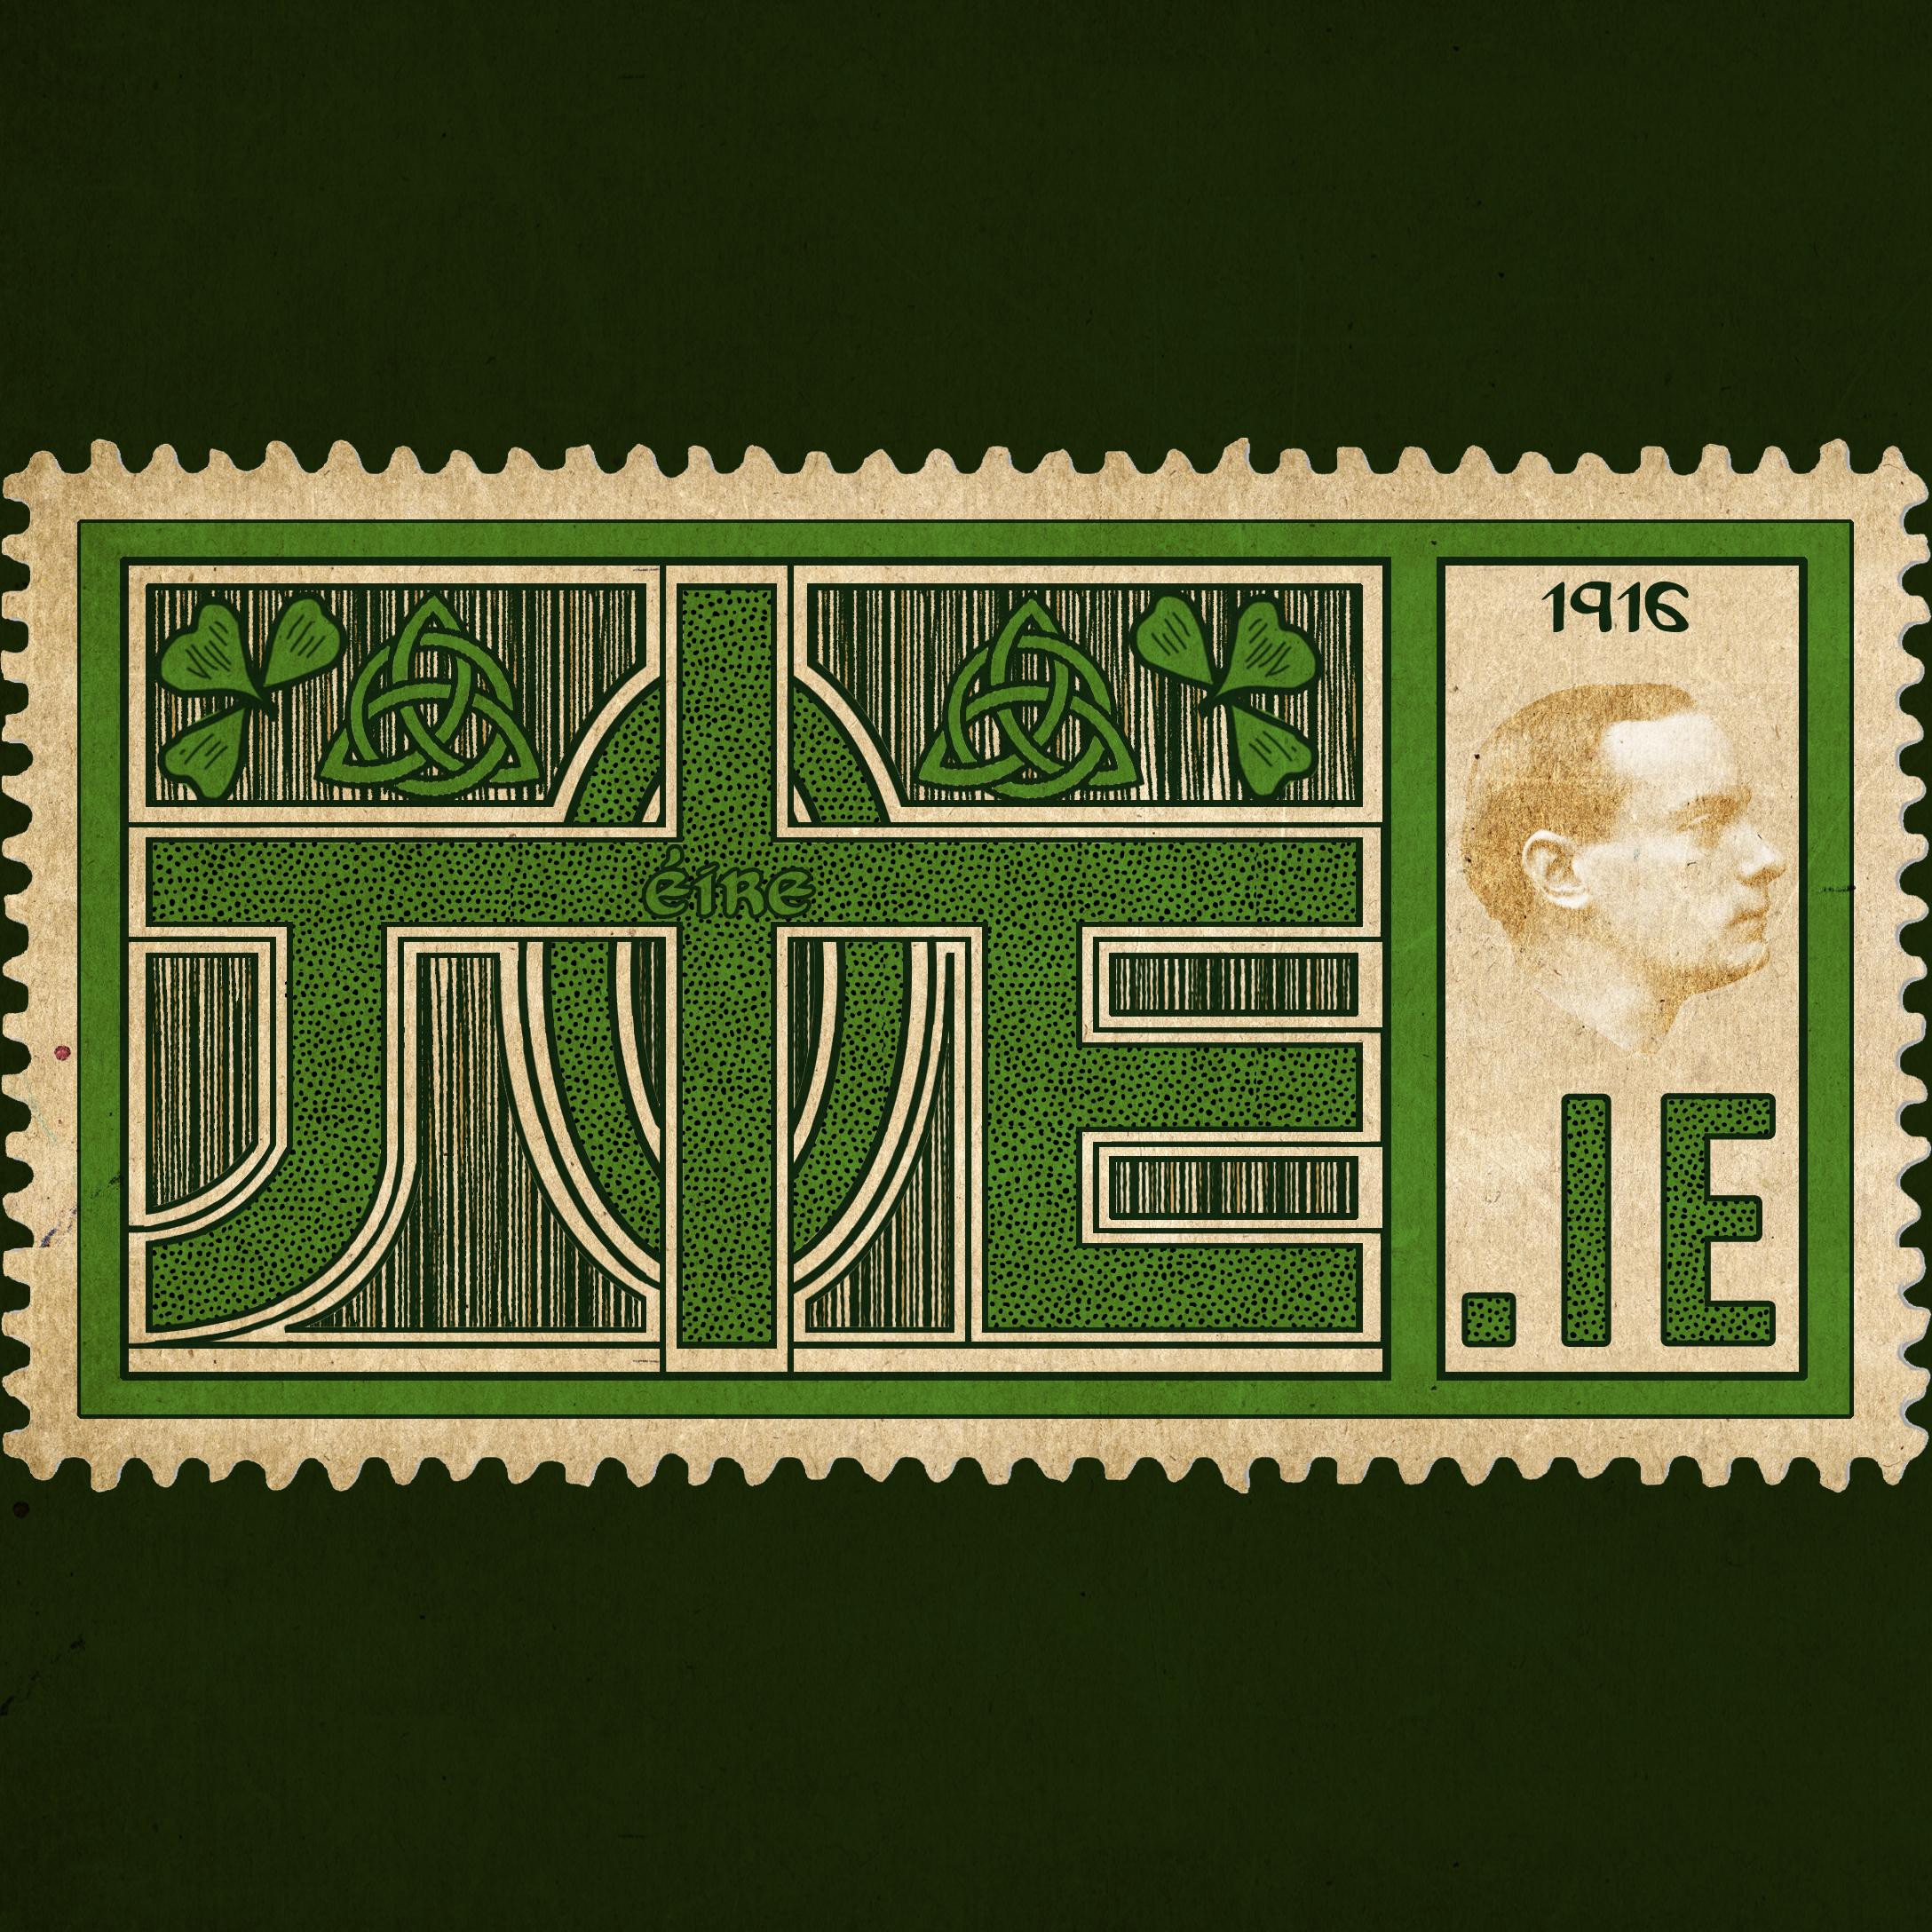 1916 JOE4